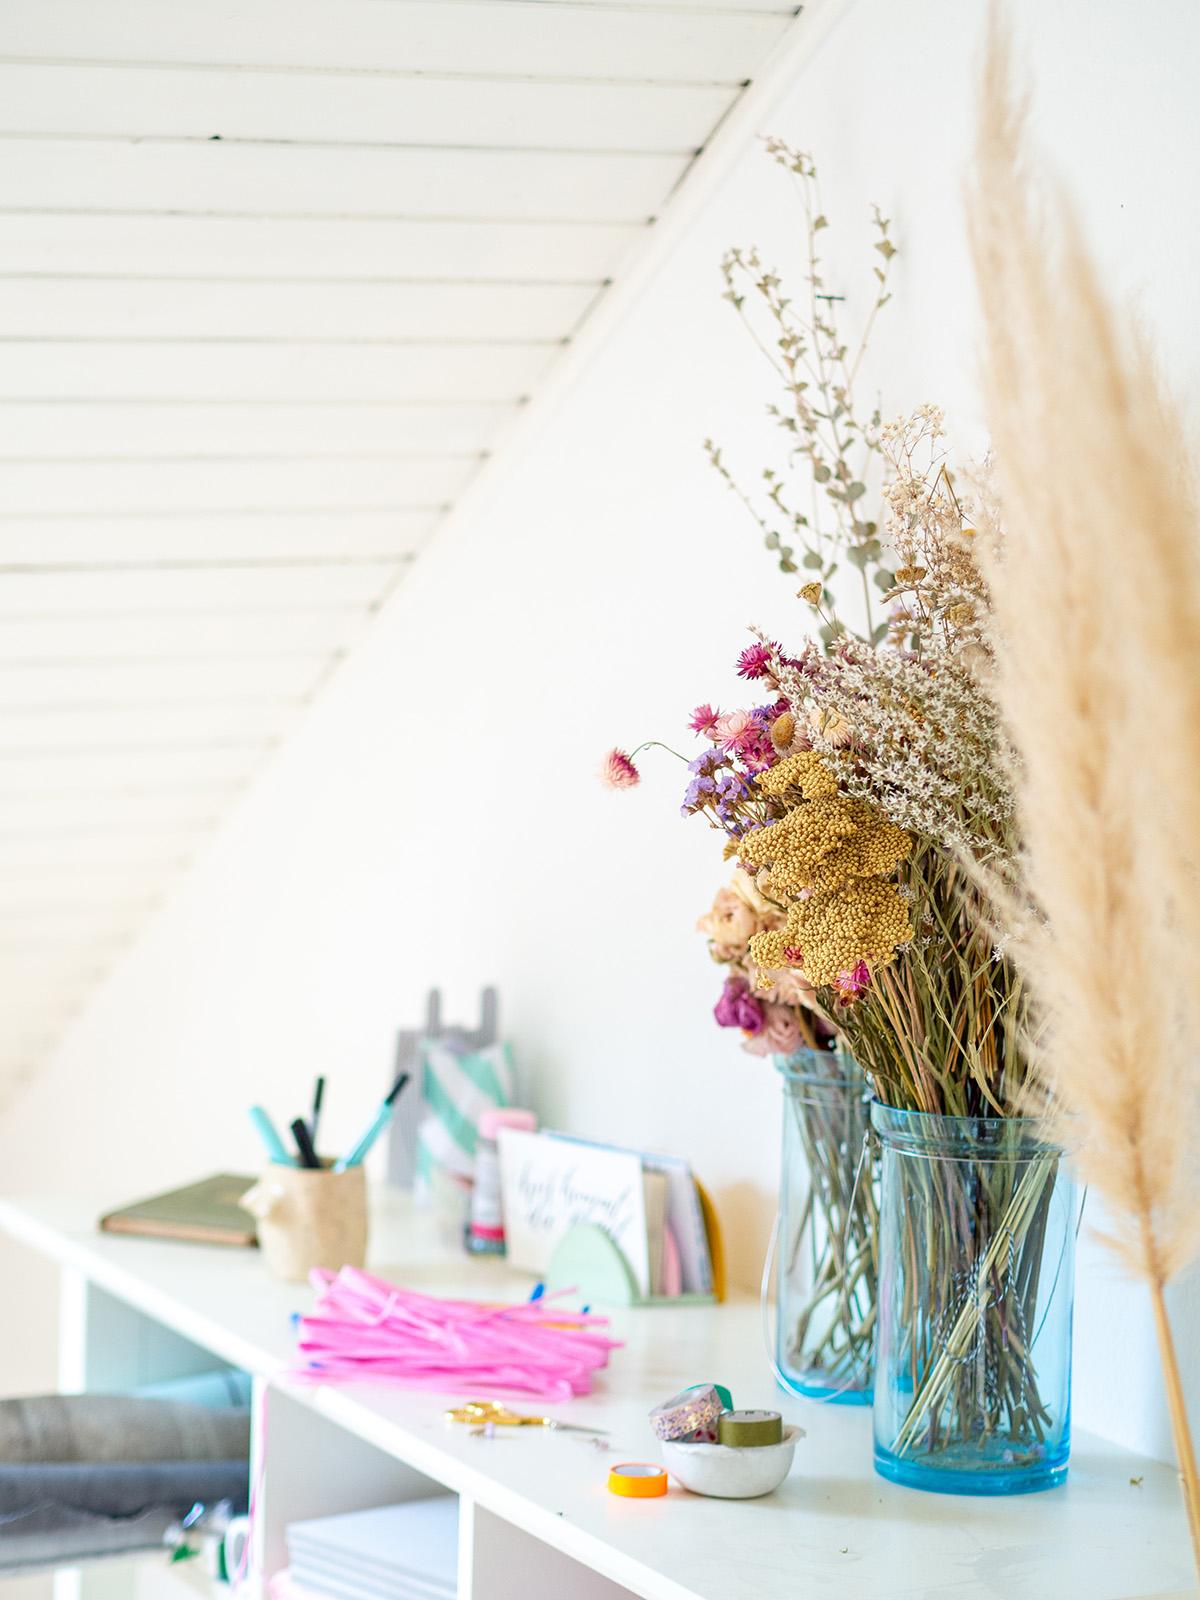 missredfox - On your creative table - Johanna Rundel 3